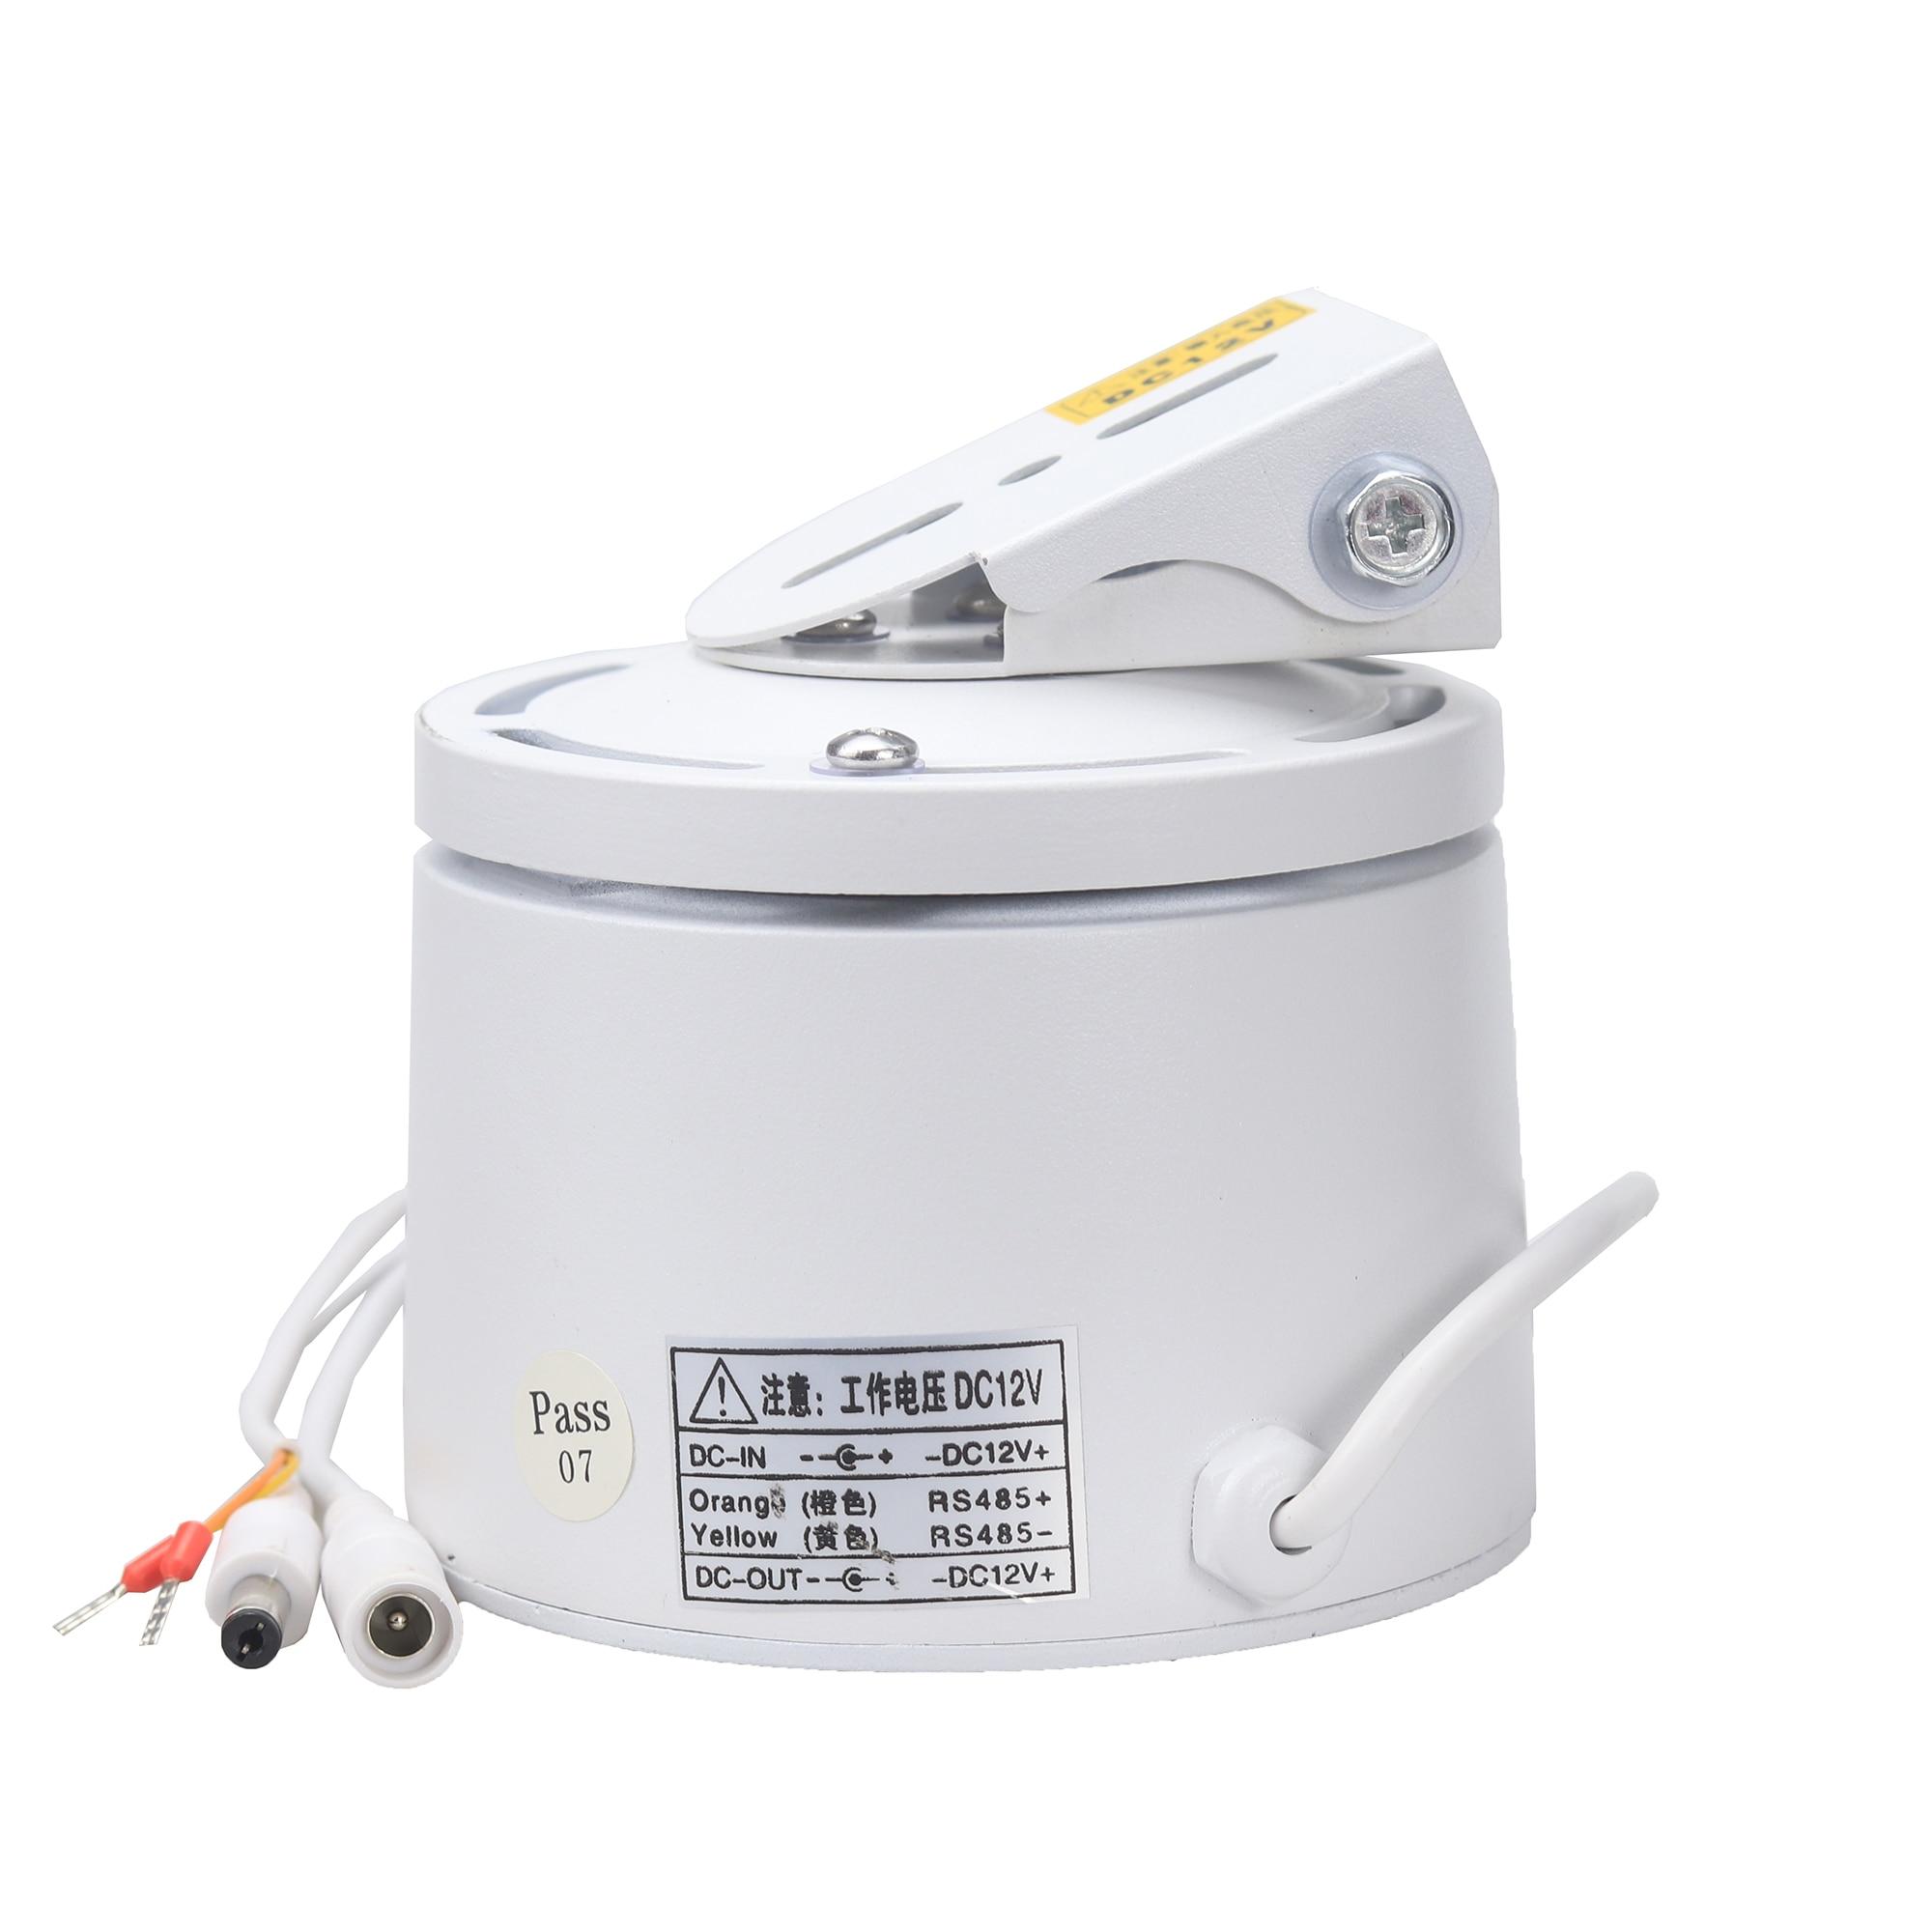 GZGMET Pan Surveillence Cctv Accessories 350 Degree Waterproof Outdoor 485 Input Ccv Camera Control Keyboard Pan